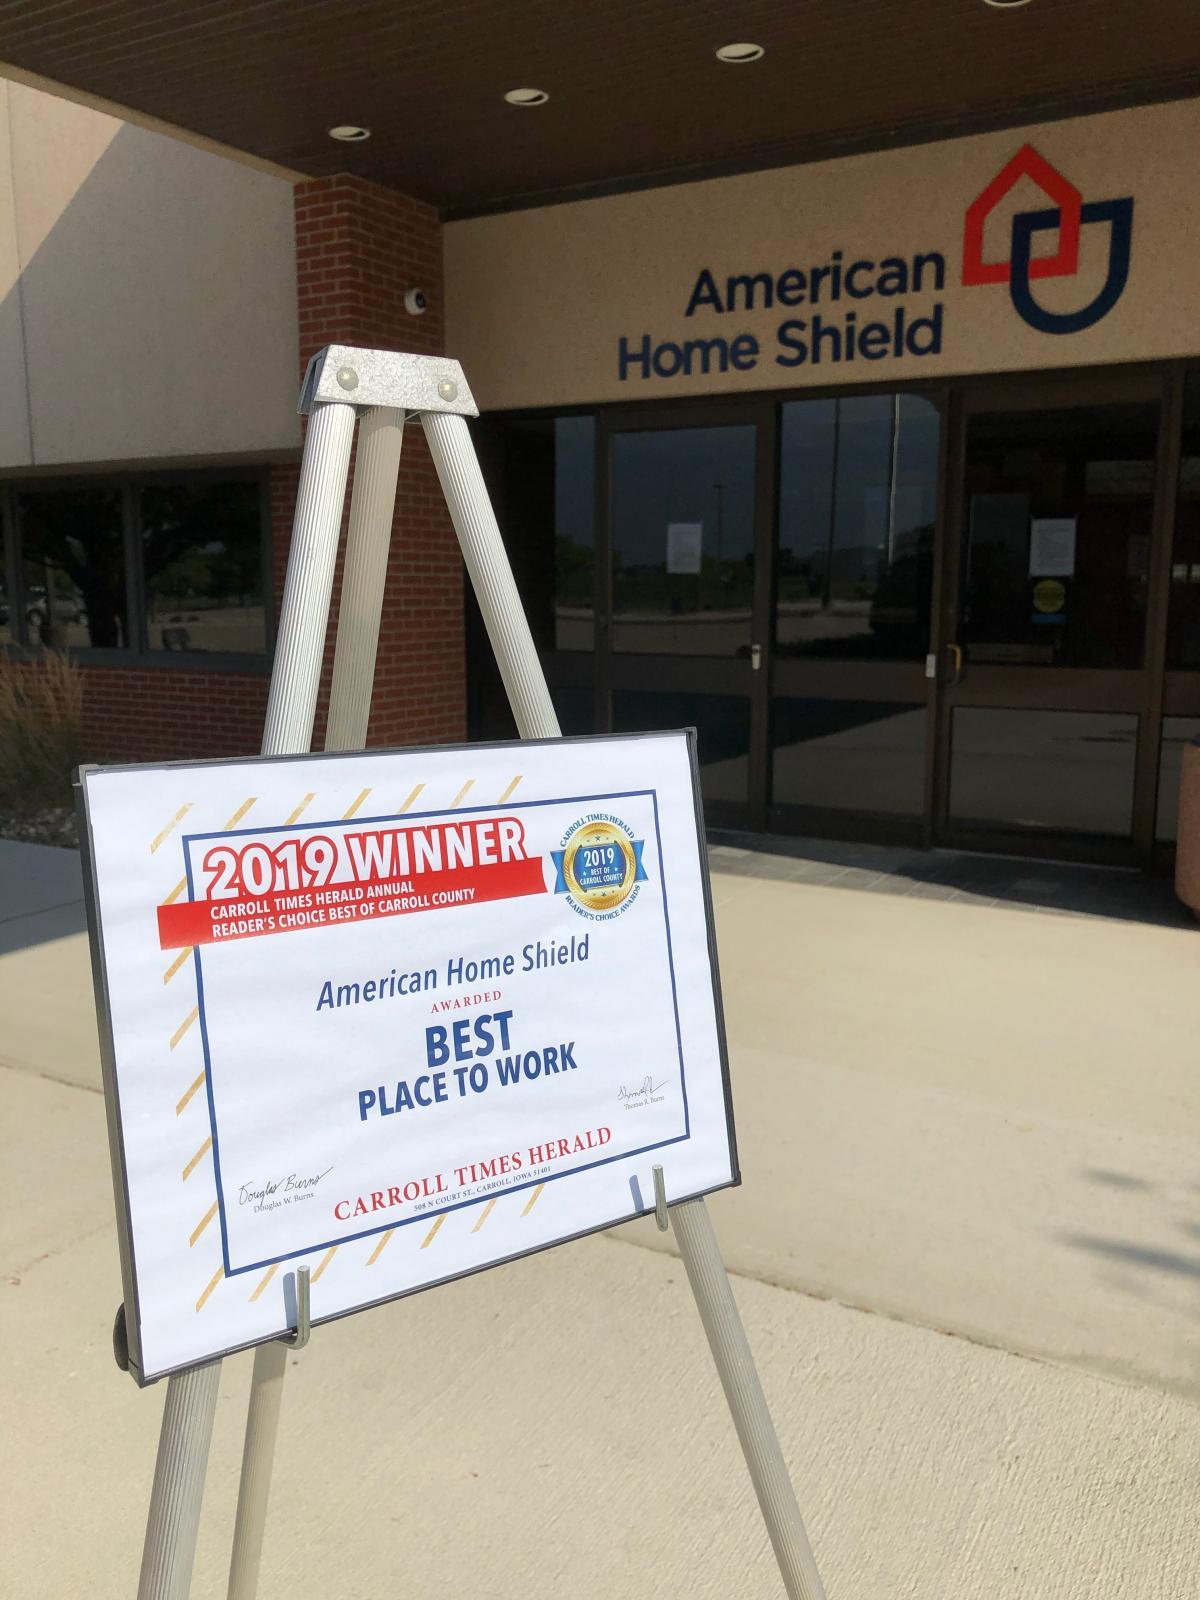 American Home Shield Is a Pillar of Carroll County Main Photo